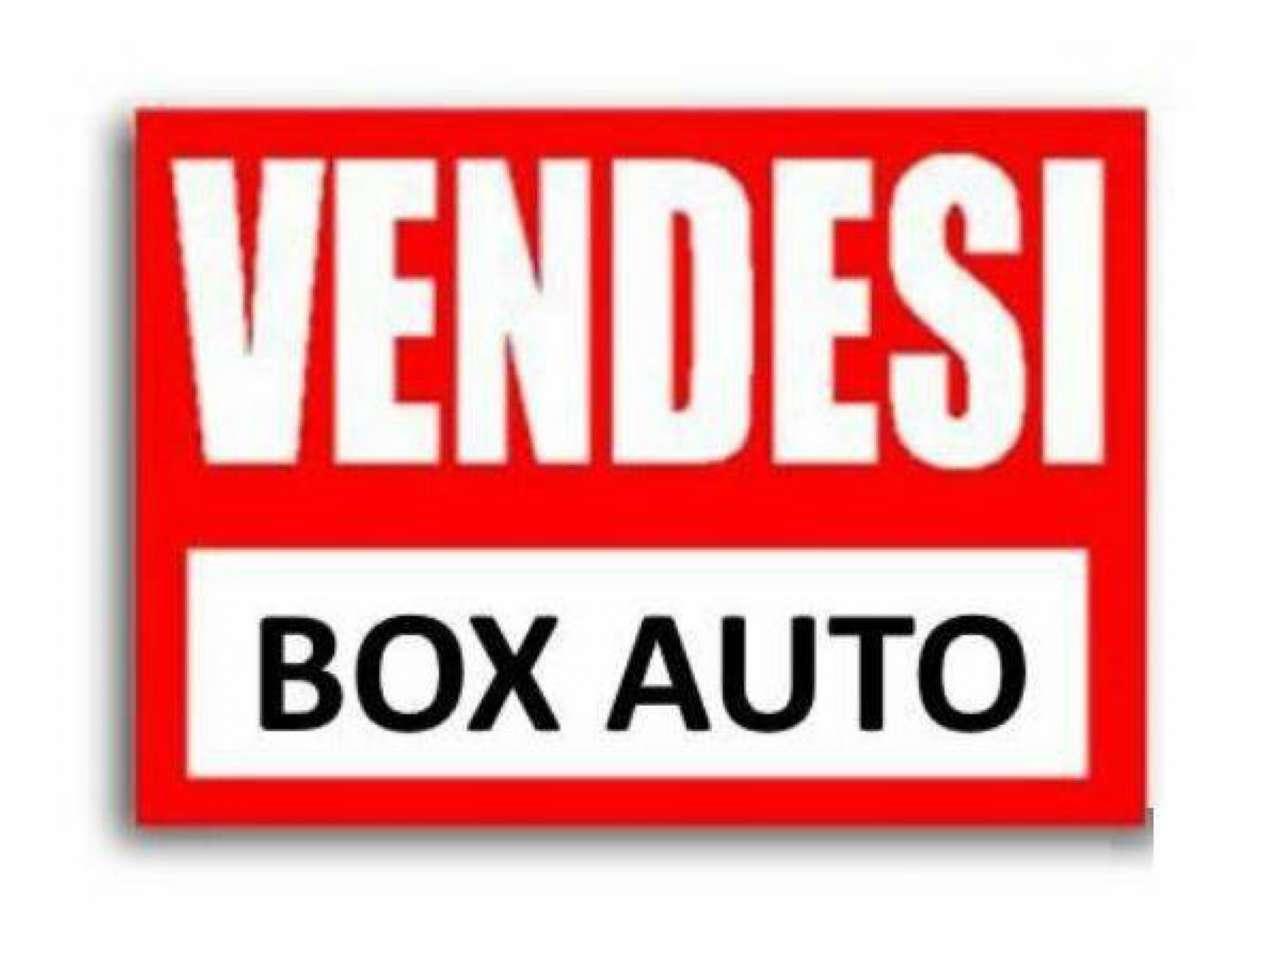 Monza Vendita BOX